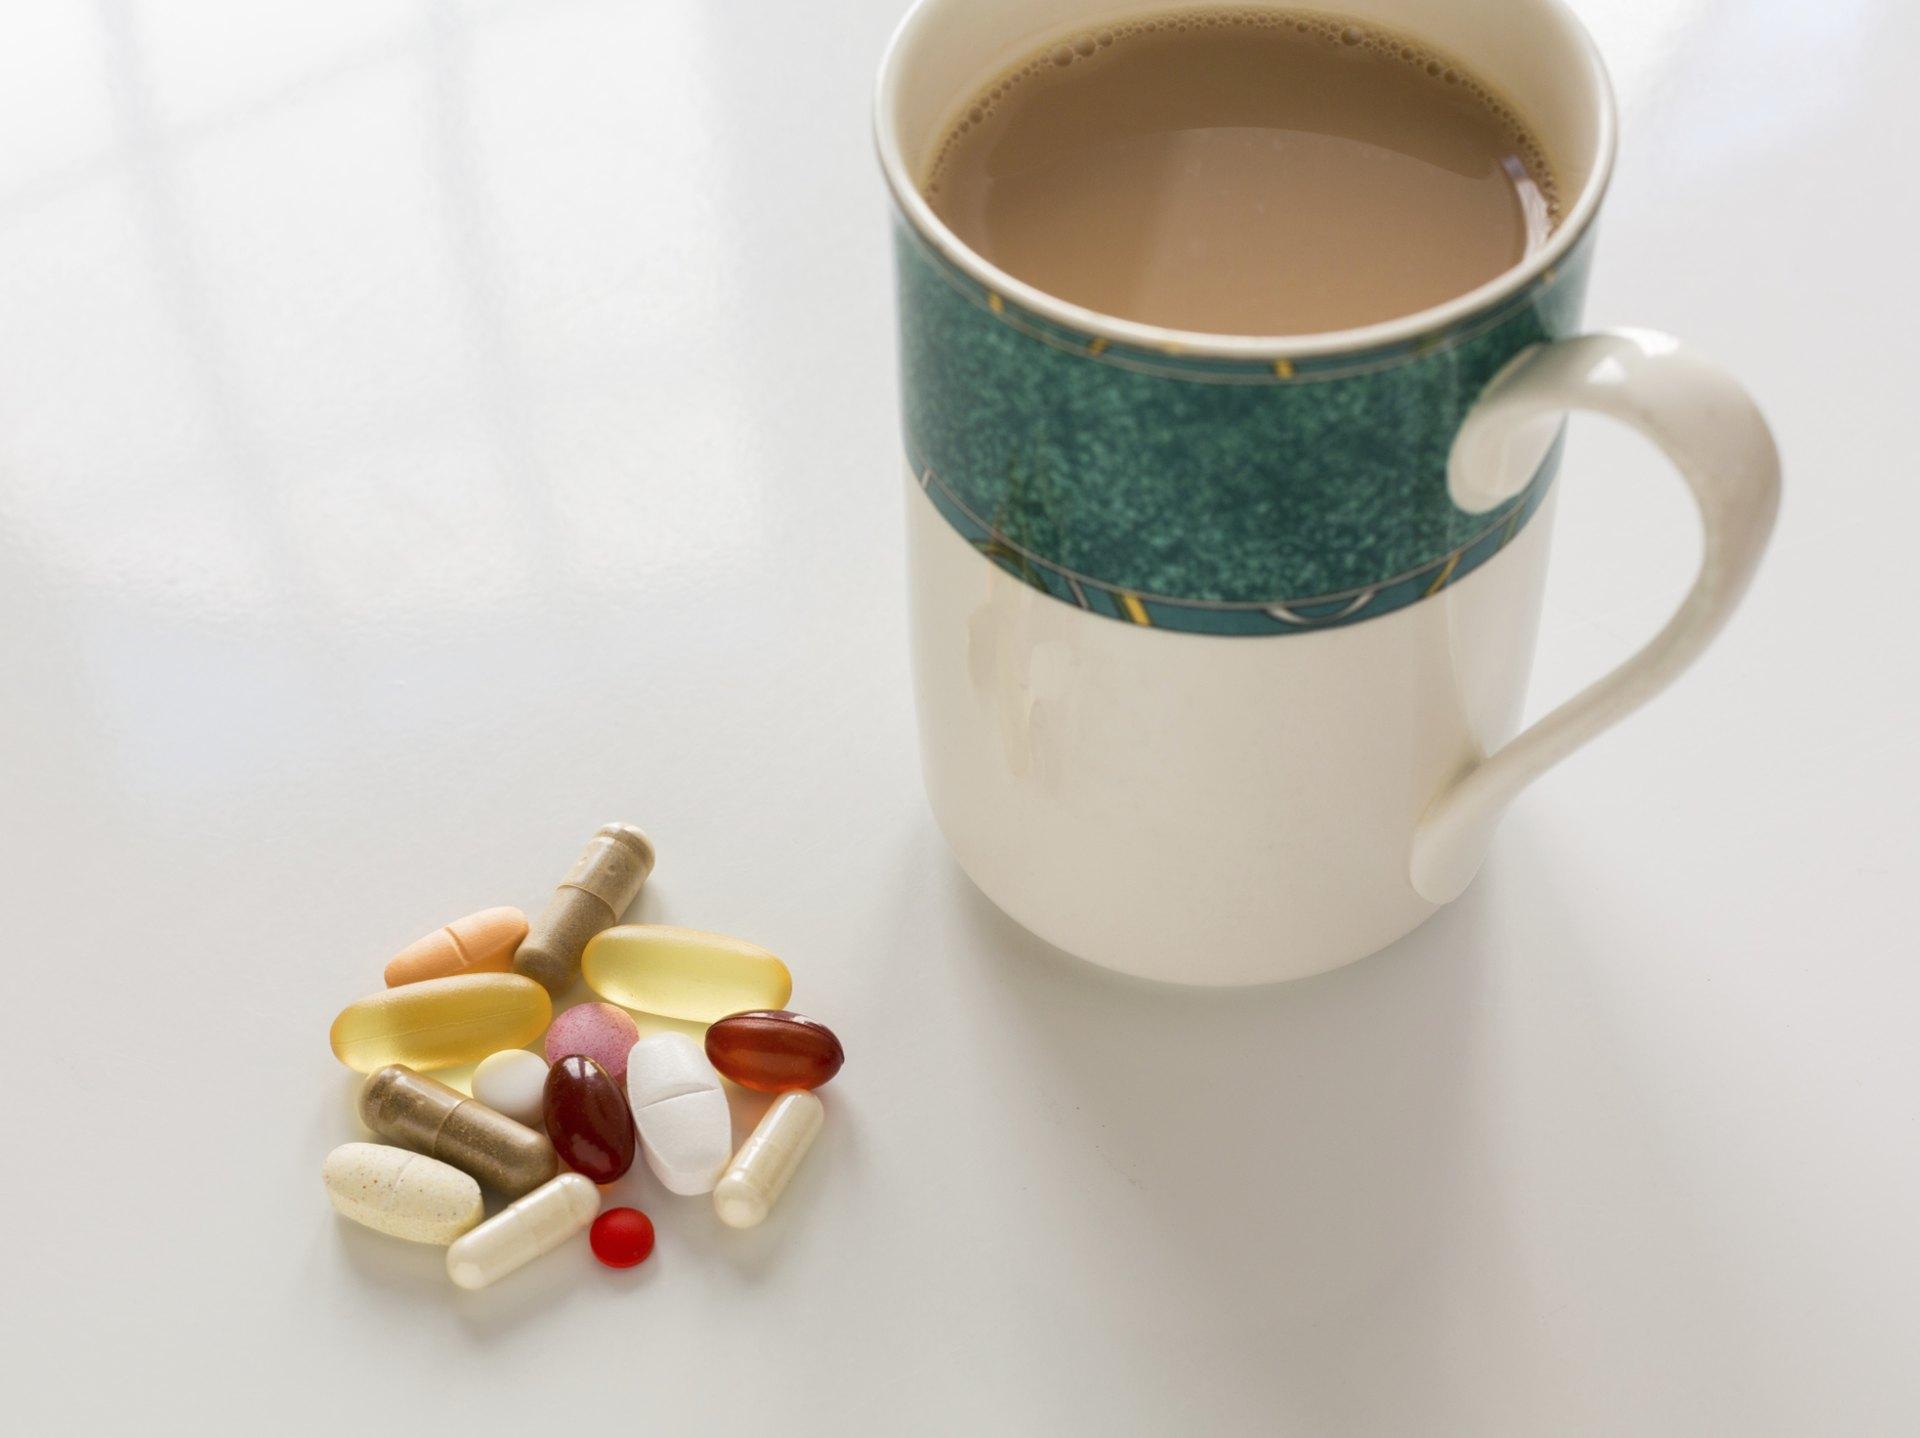 lexapro doses